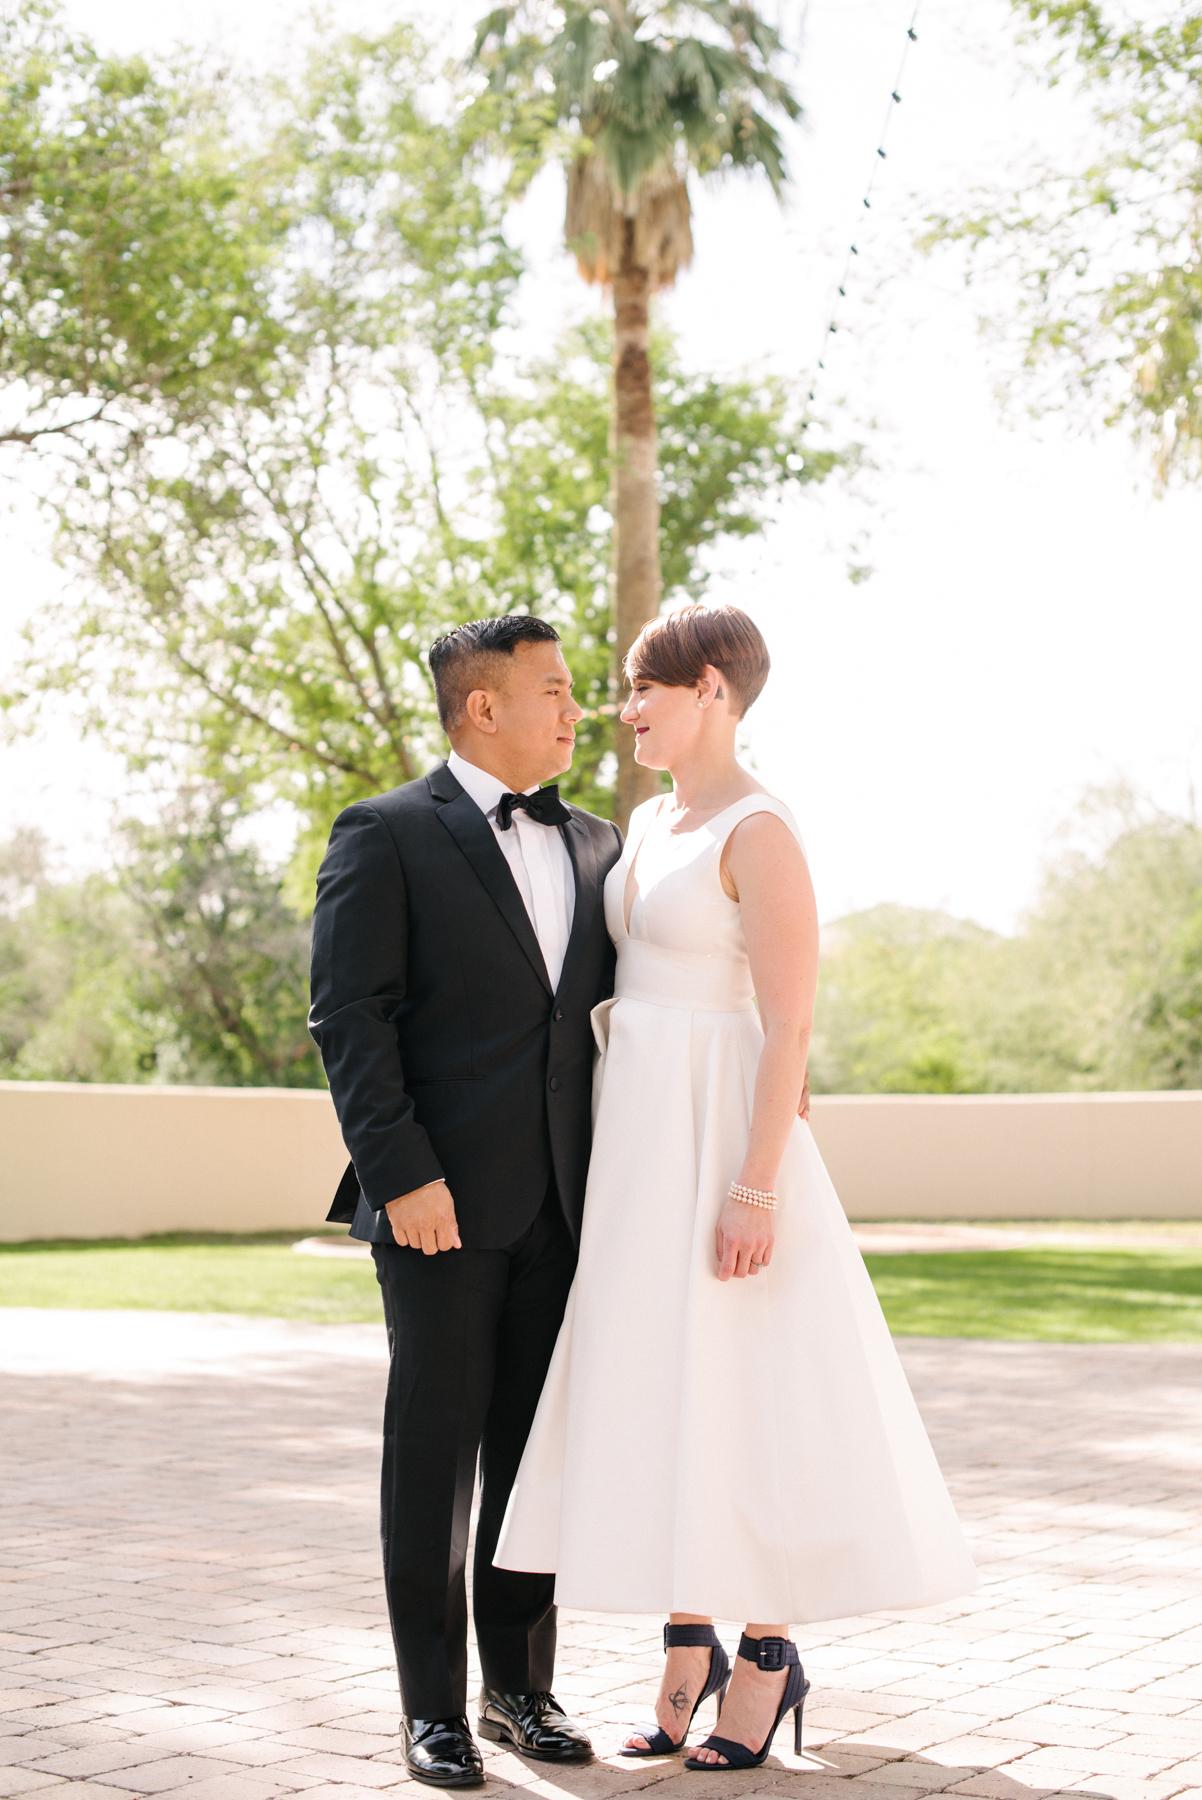 Secret Garden Event Center Wedding - Meredith Amadee Photography-38.jpg